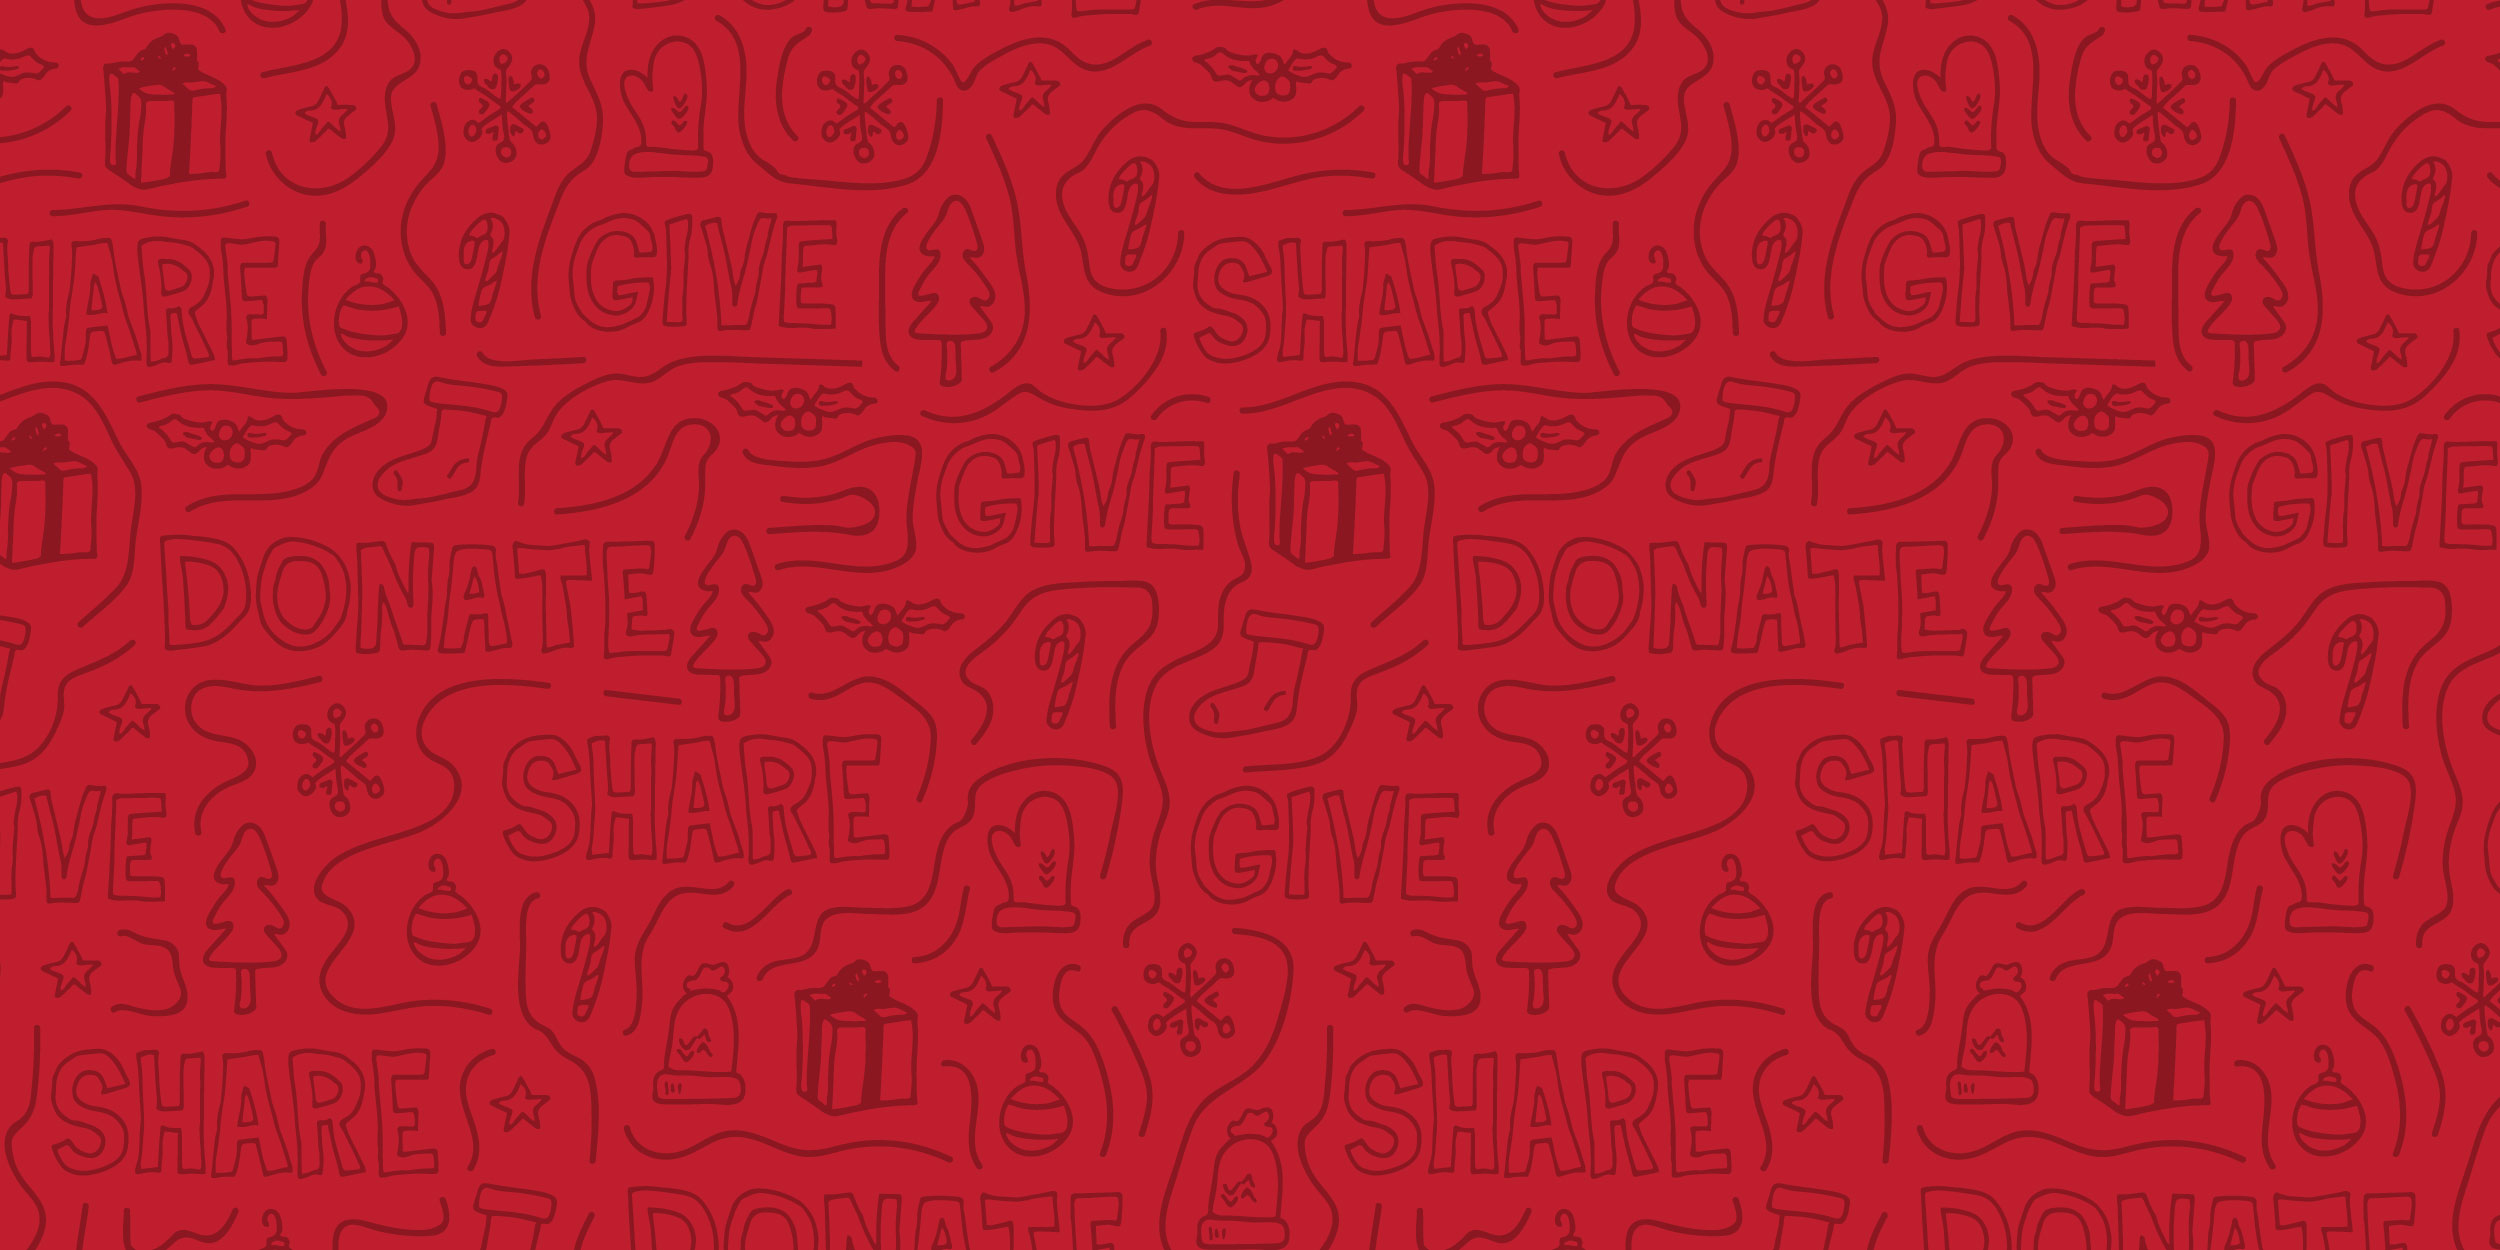 Share Hope this Christmas